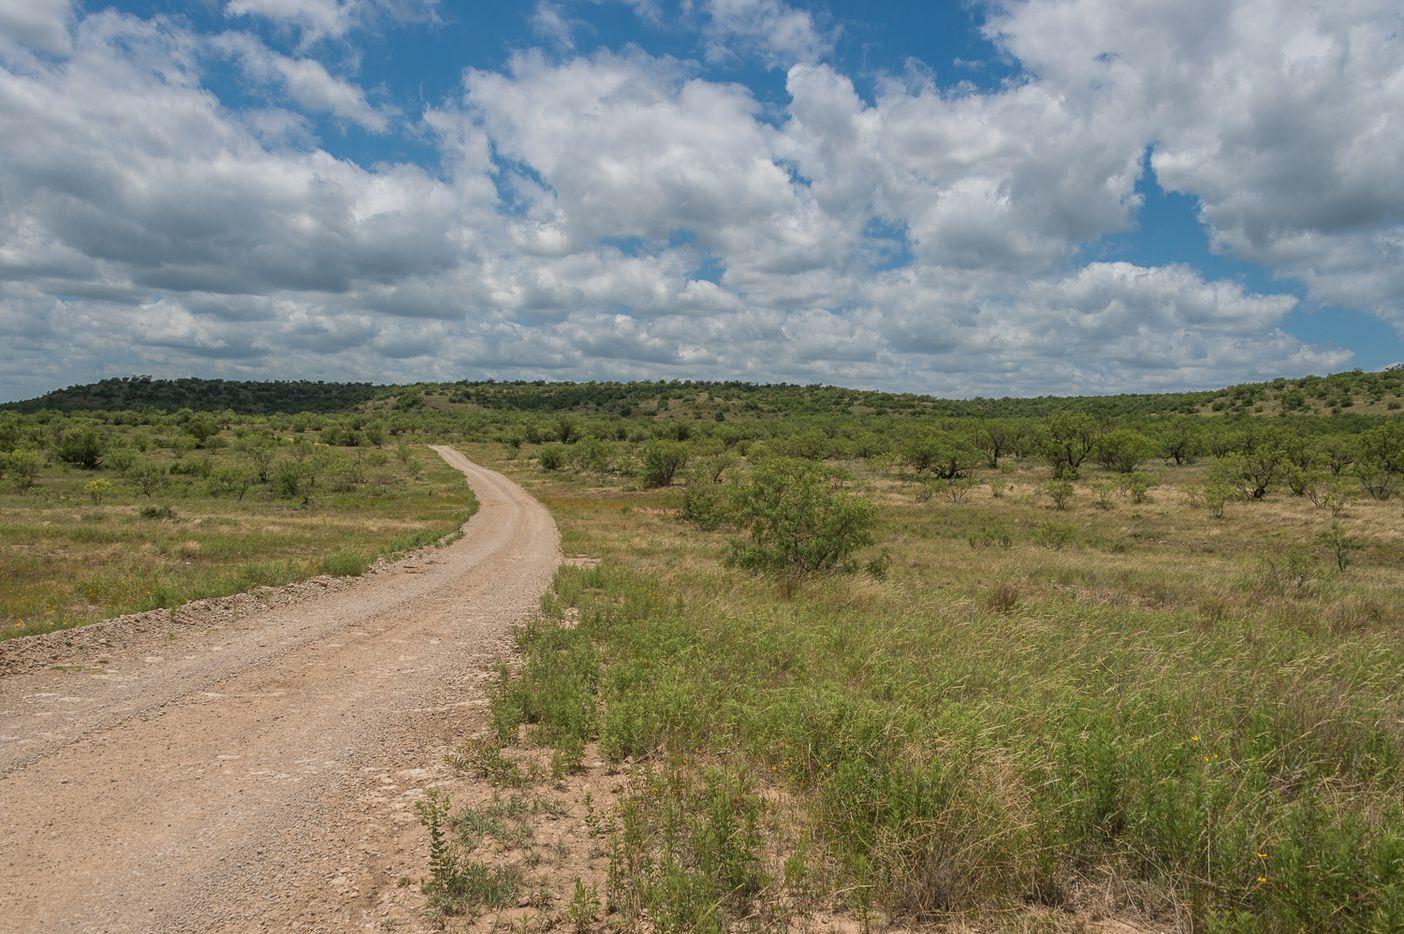 The Comanche Crest Ranch is more than 10,000 acres.